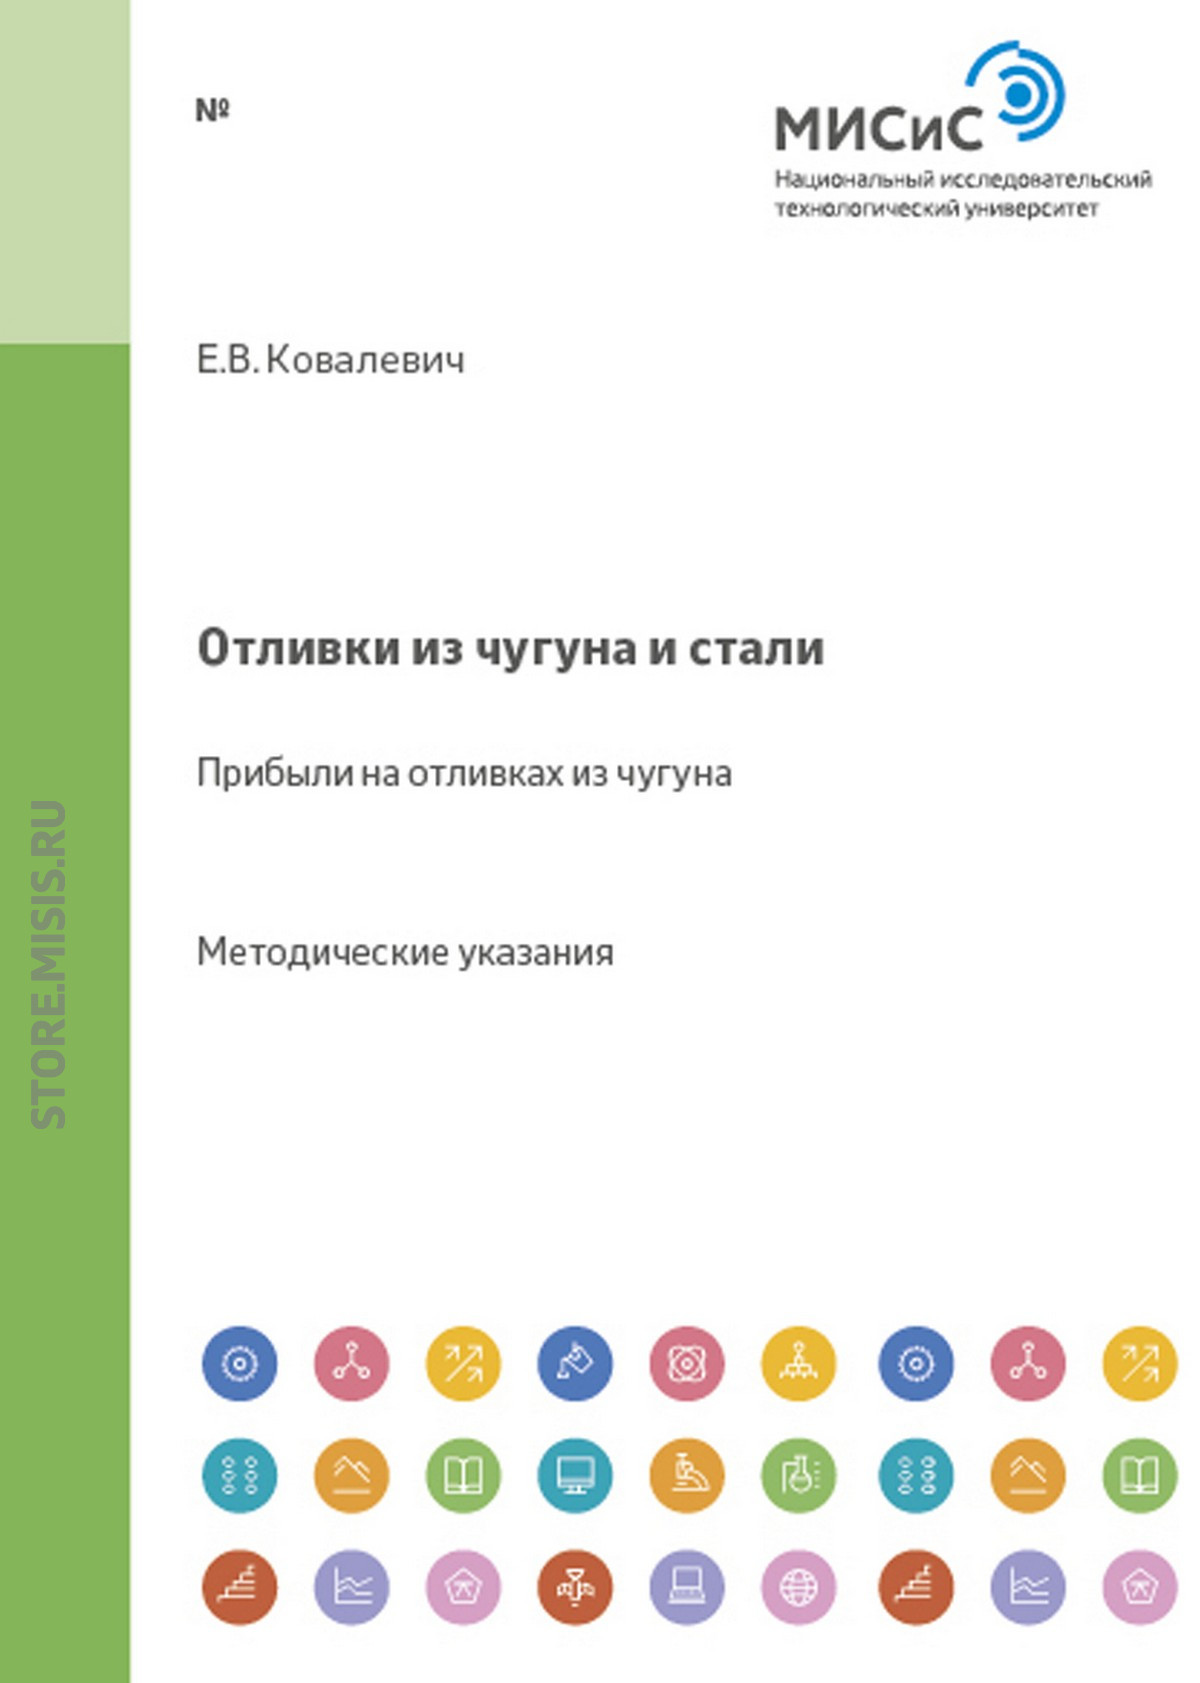 Евгений Ковалевич Отливки из чугуна и стали. Прибыли на отливках из чугуна